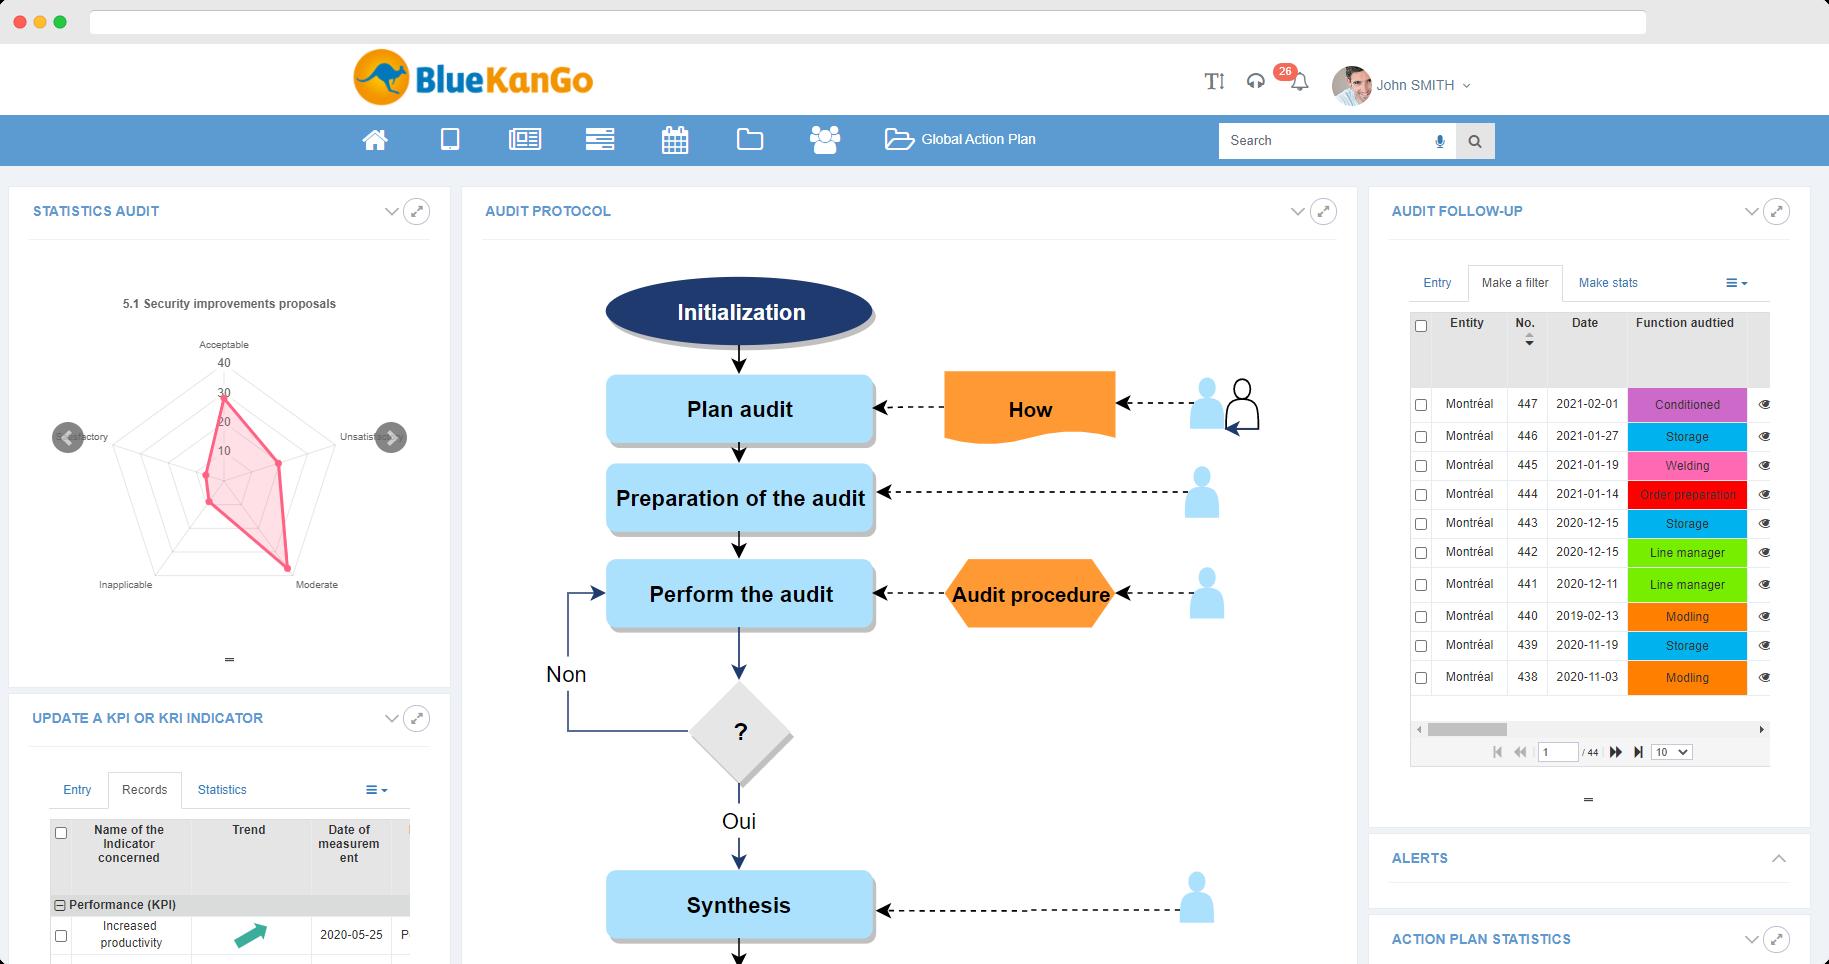 Dashboard of Field audit on mobile devices by BlueKanGo